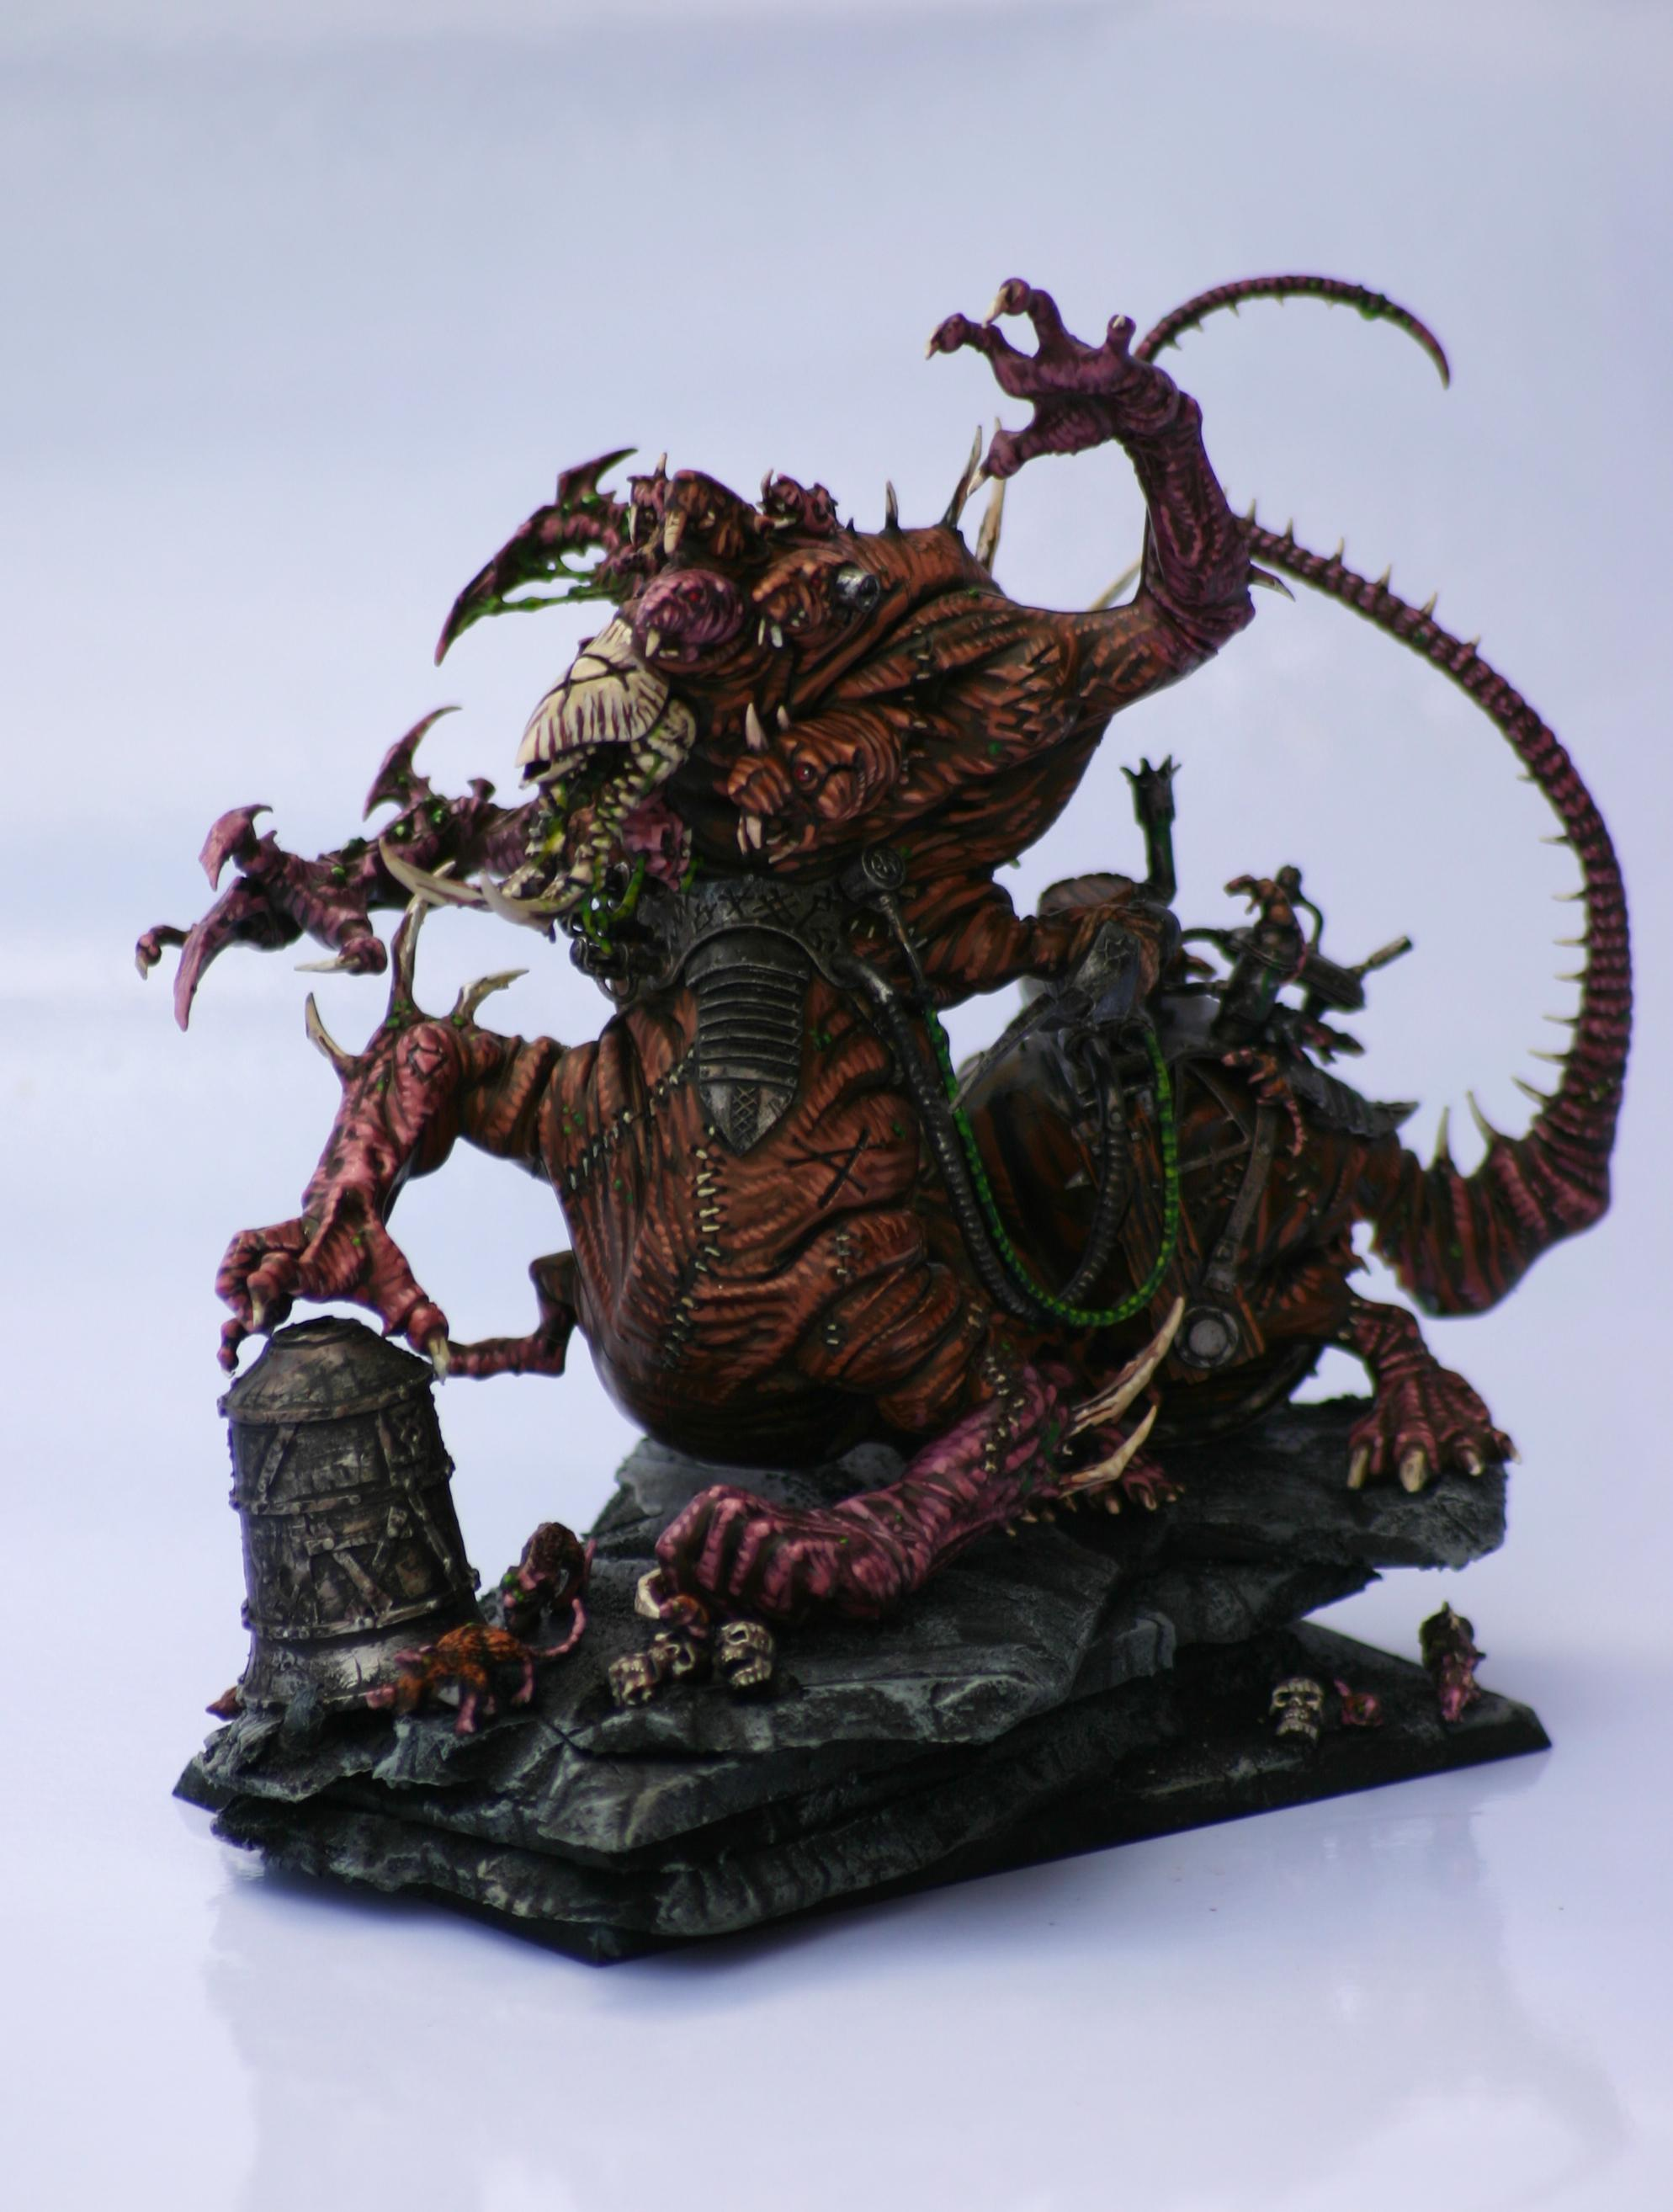 Hell Pit Abomination, Hell Pit Abomination Warhammer, Skaven, Warhammer Fantasy